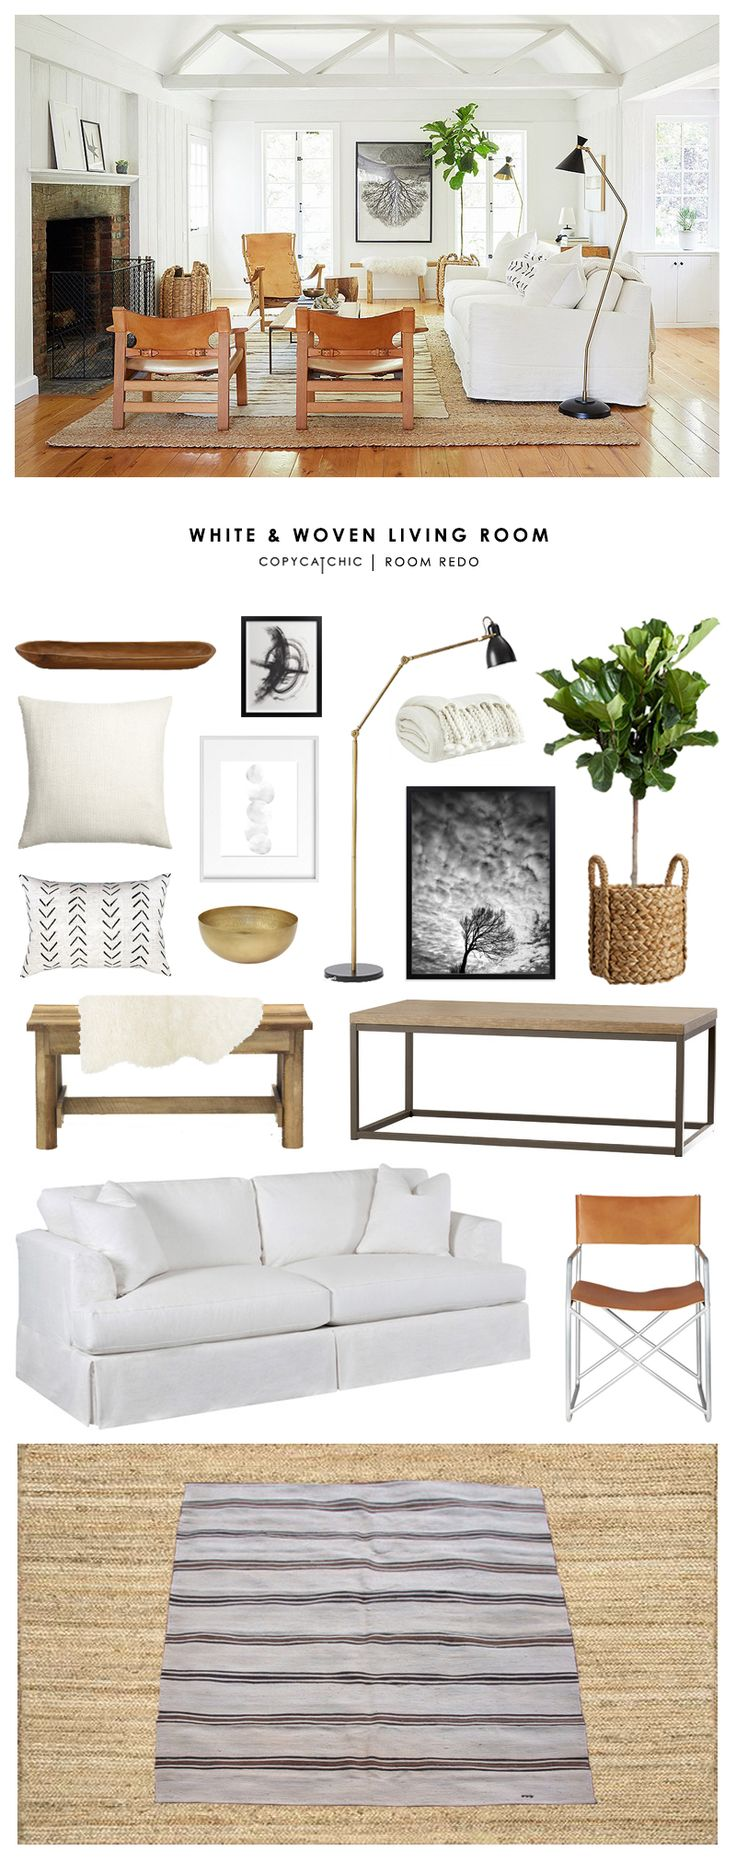 Living Room Jute Rug best 10+ jute rug ideas on pinterest | natural fiber rugs, rustic